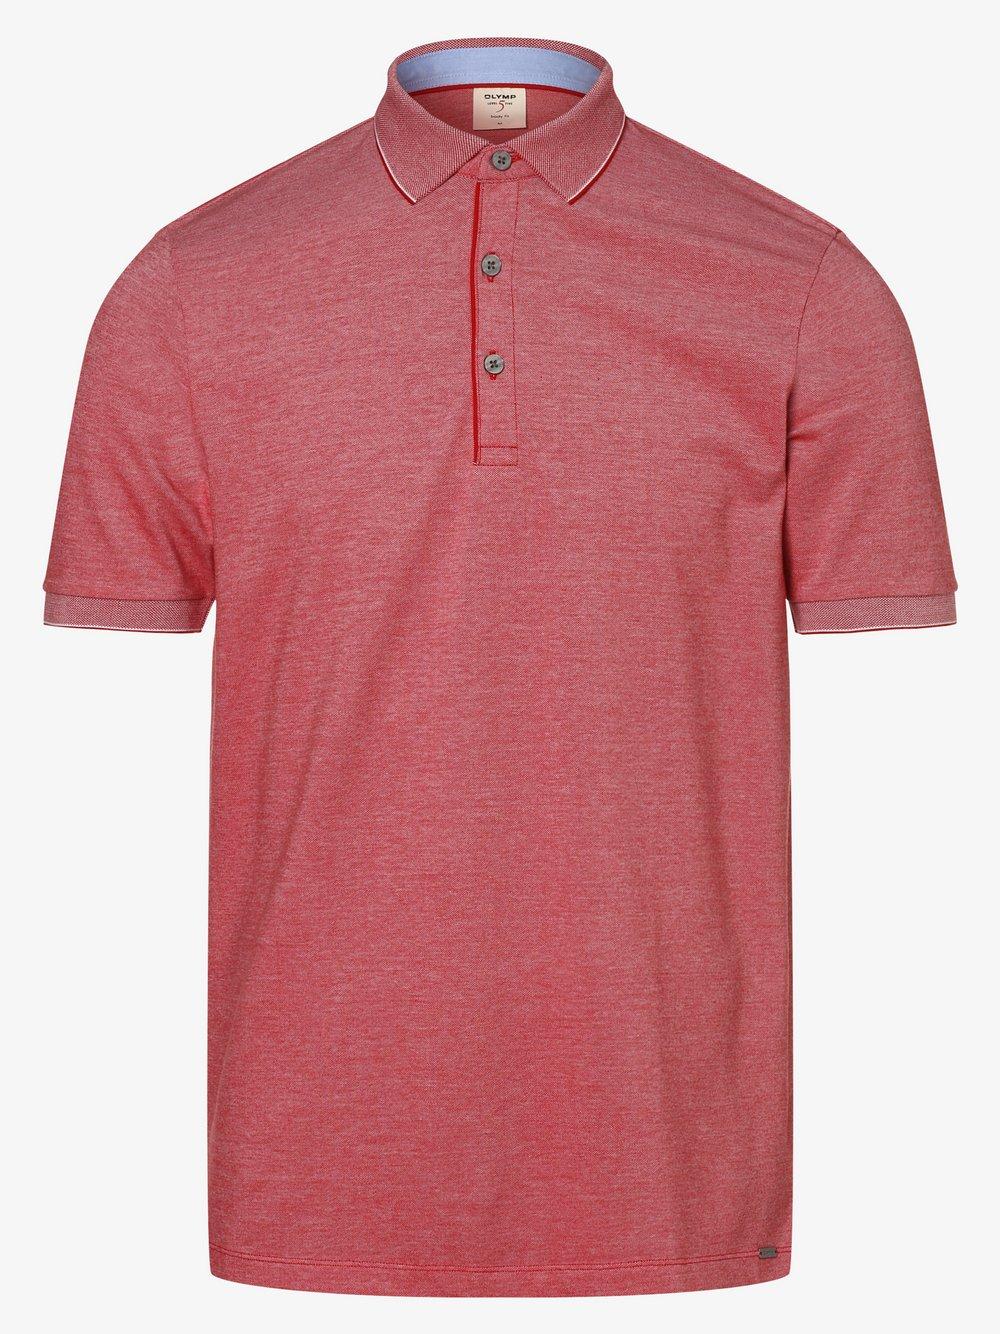 Olymp Level Five – Męska koszulka polo, czerwony Van Graaf 463441-0006